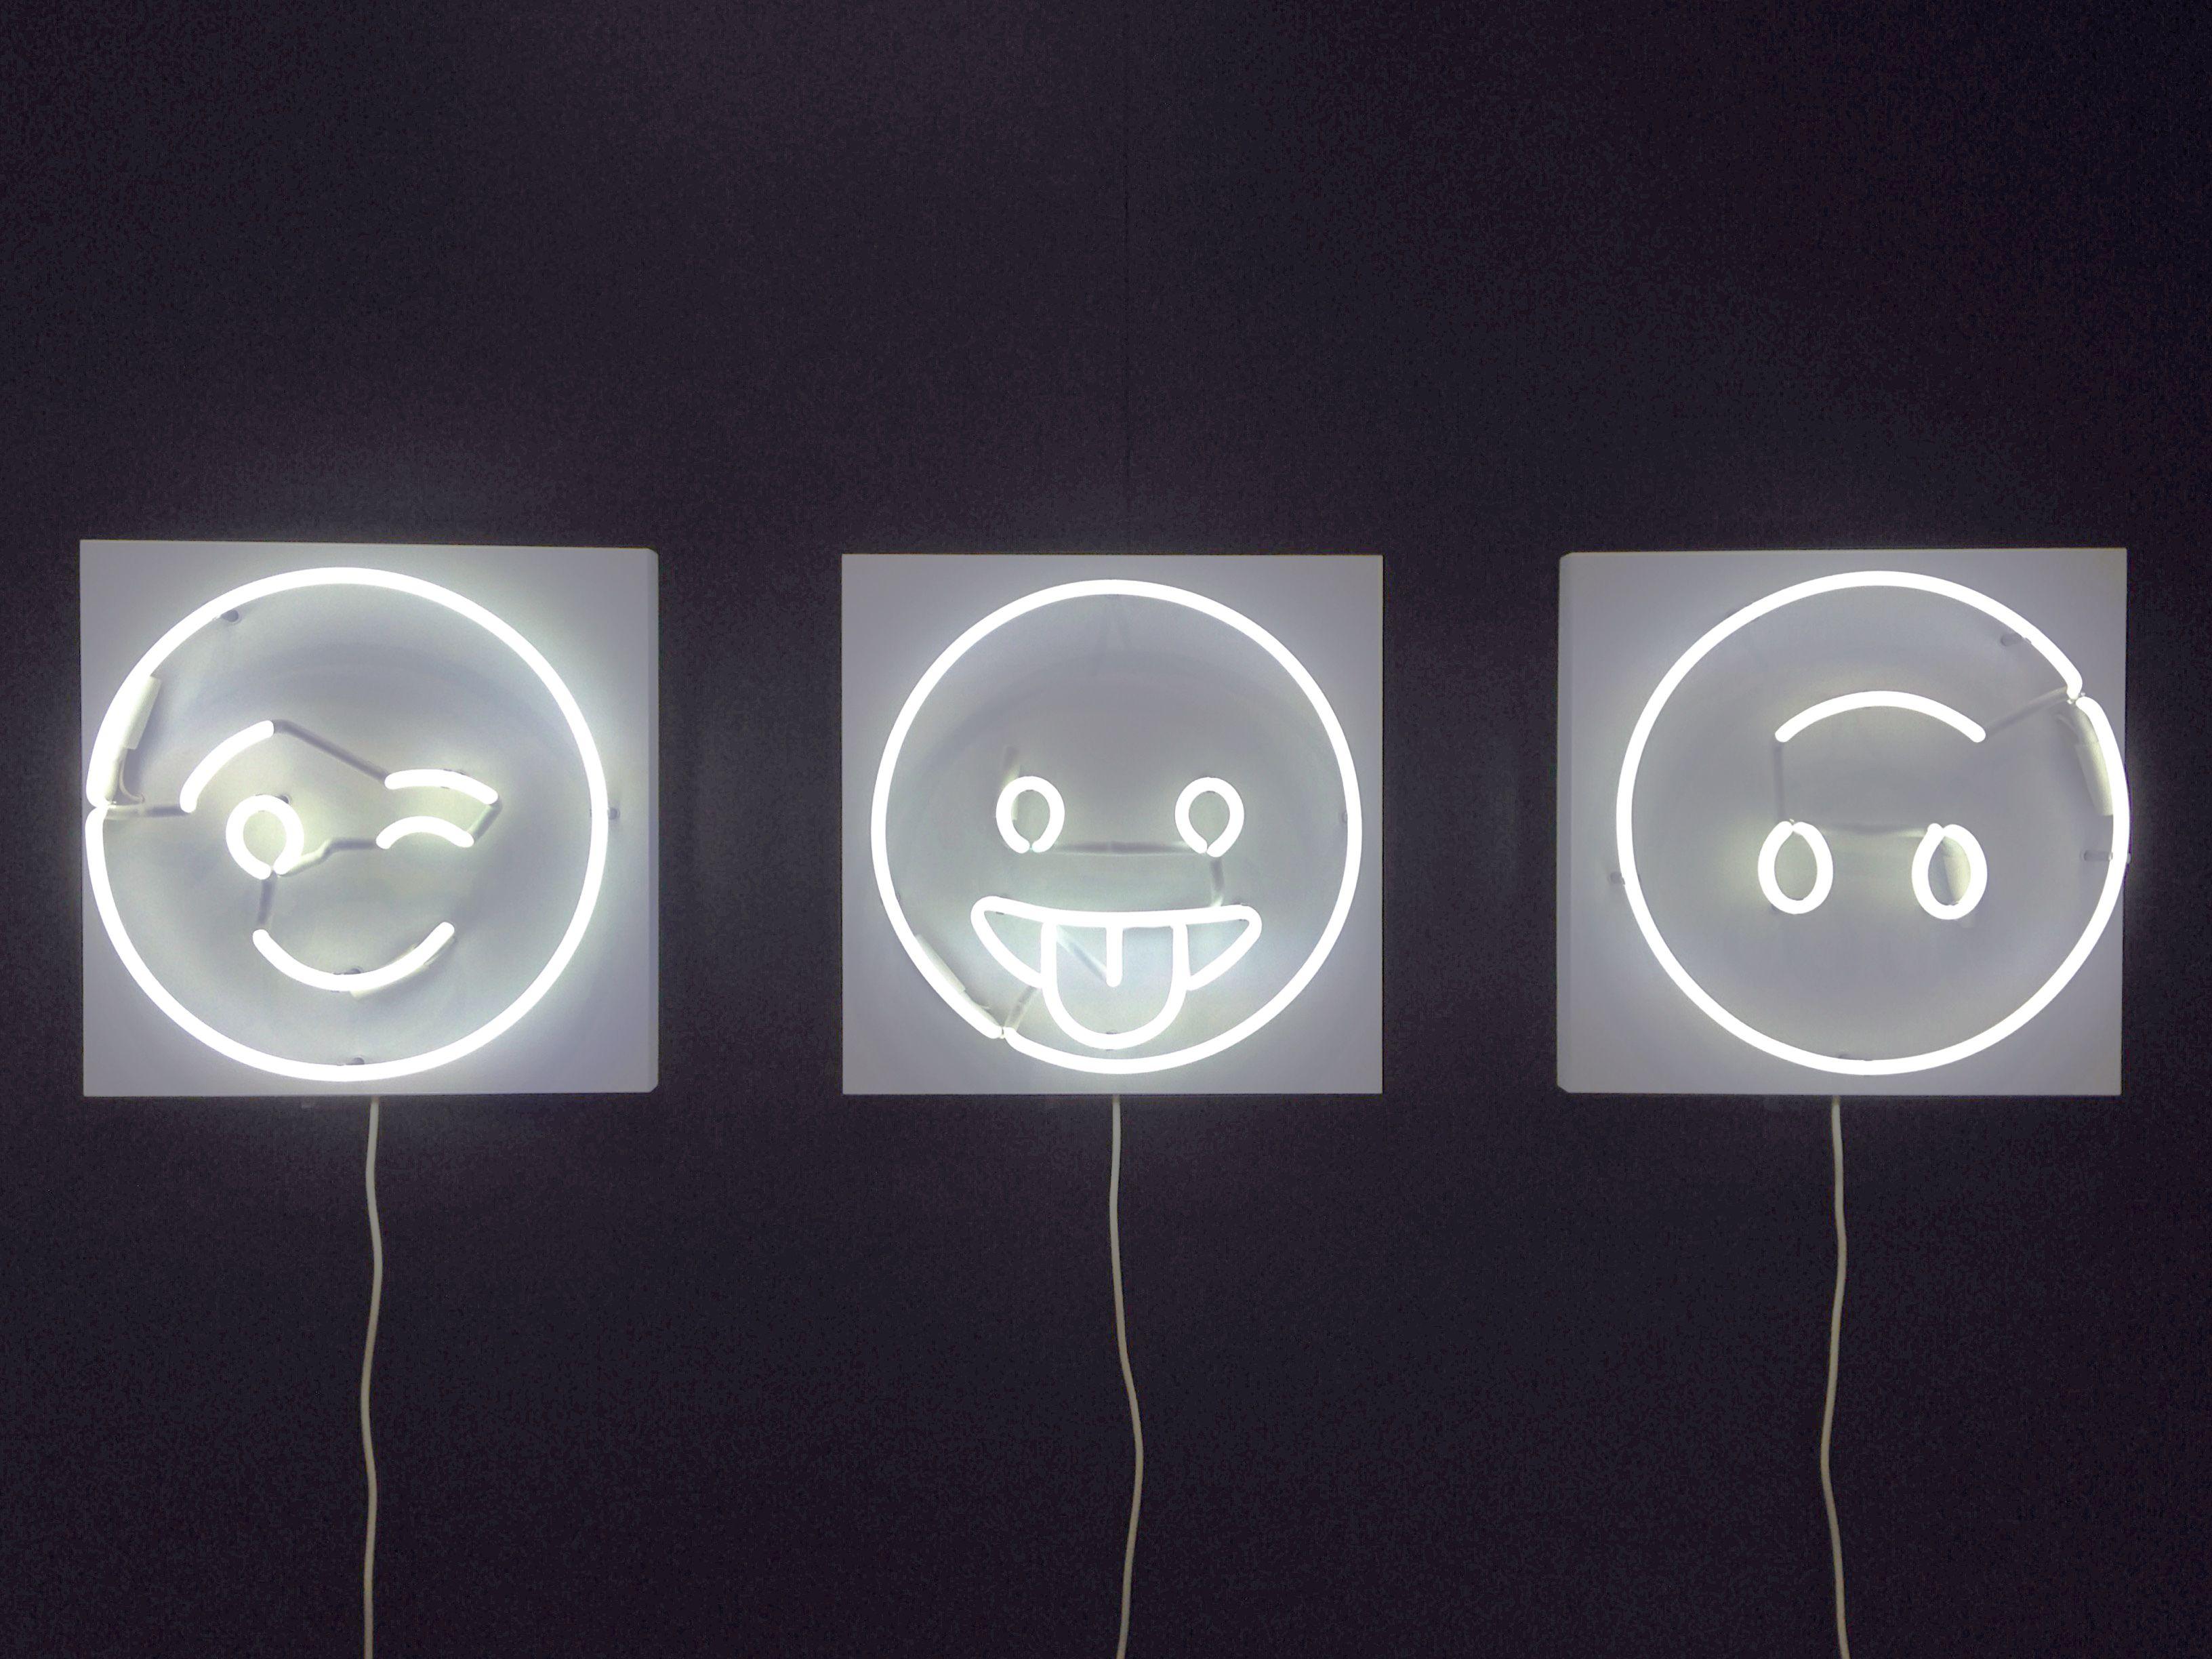 Happy #WorldEmojiDay! We're celebrating with Alice Taranto's neon emoji collection: Lit